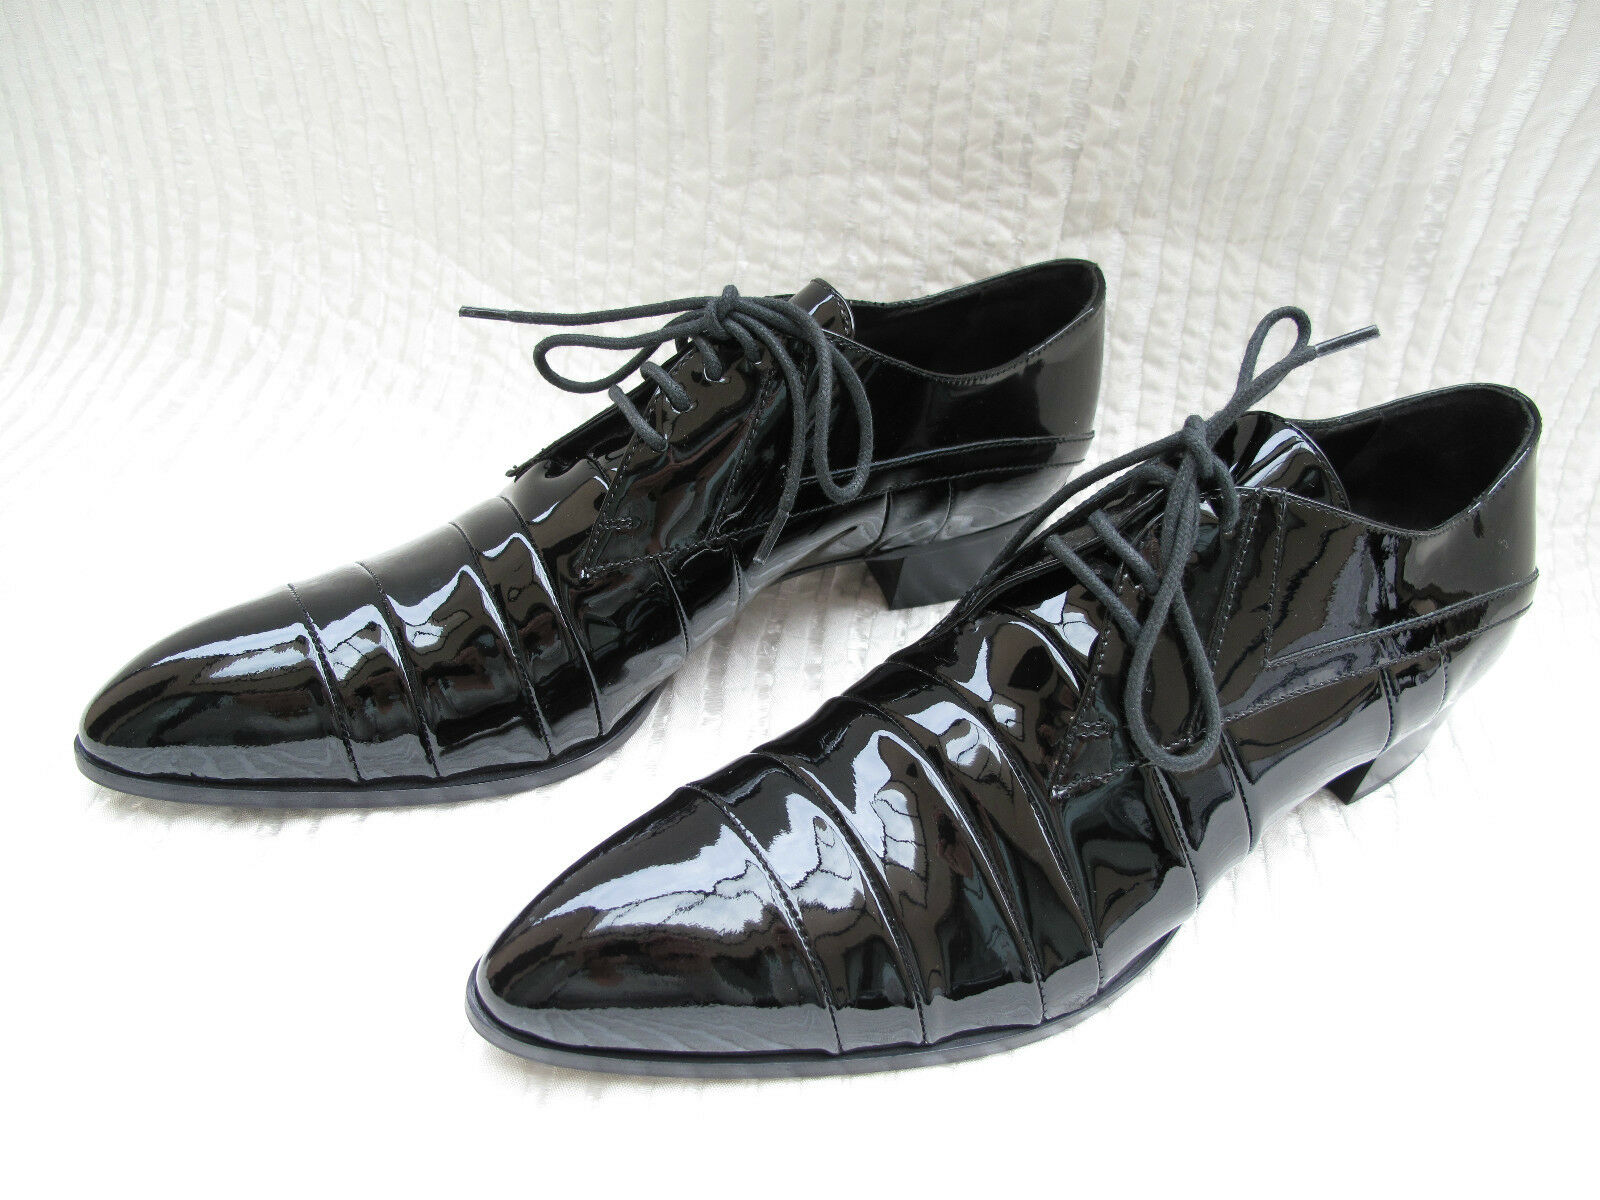 Original Miu Miu Damen Schuhe Echt Leder Lack schwarz Gr 37,5 NEU!